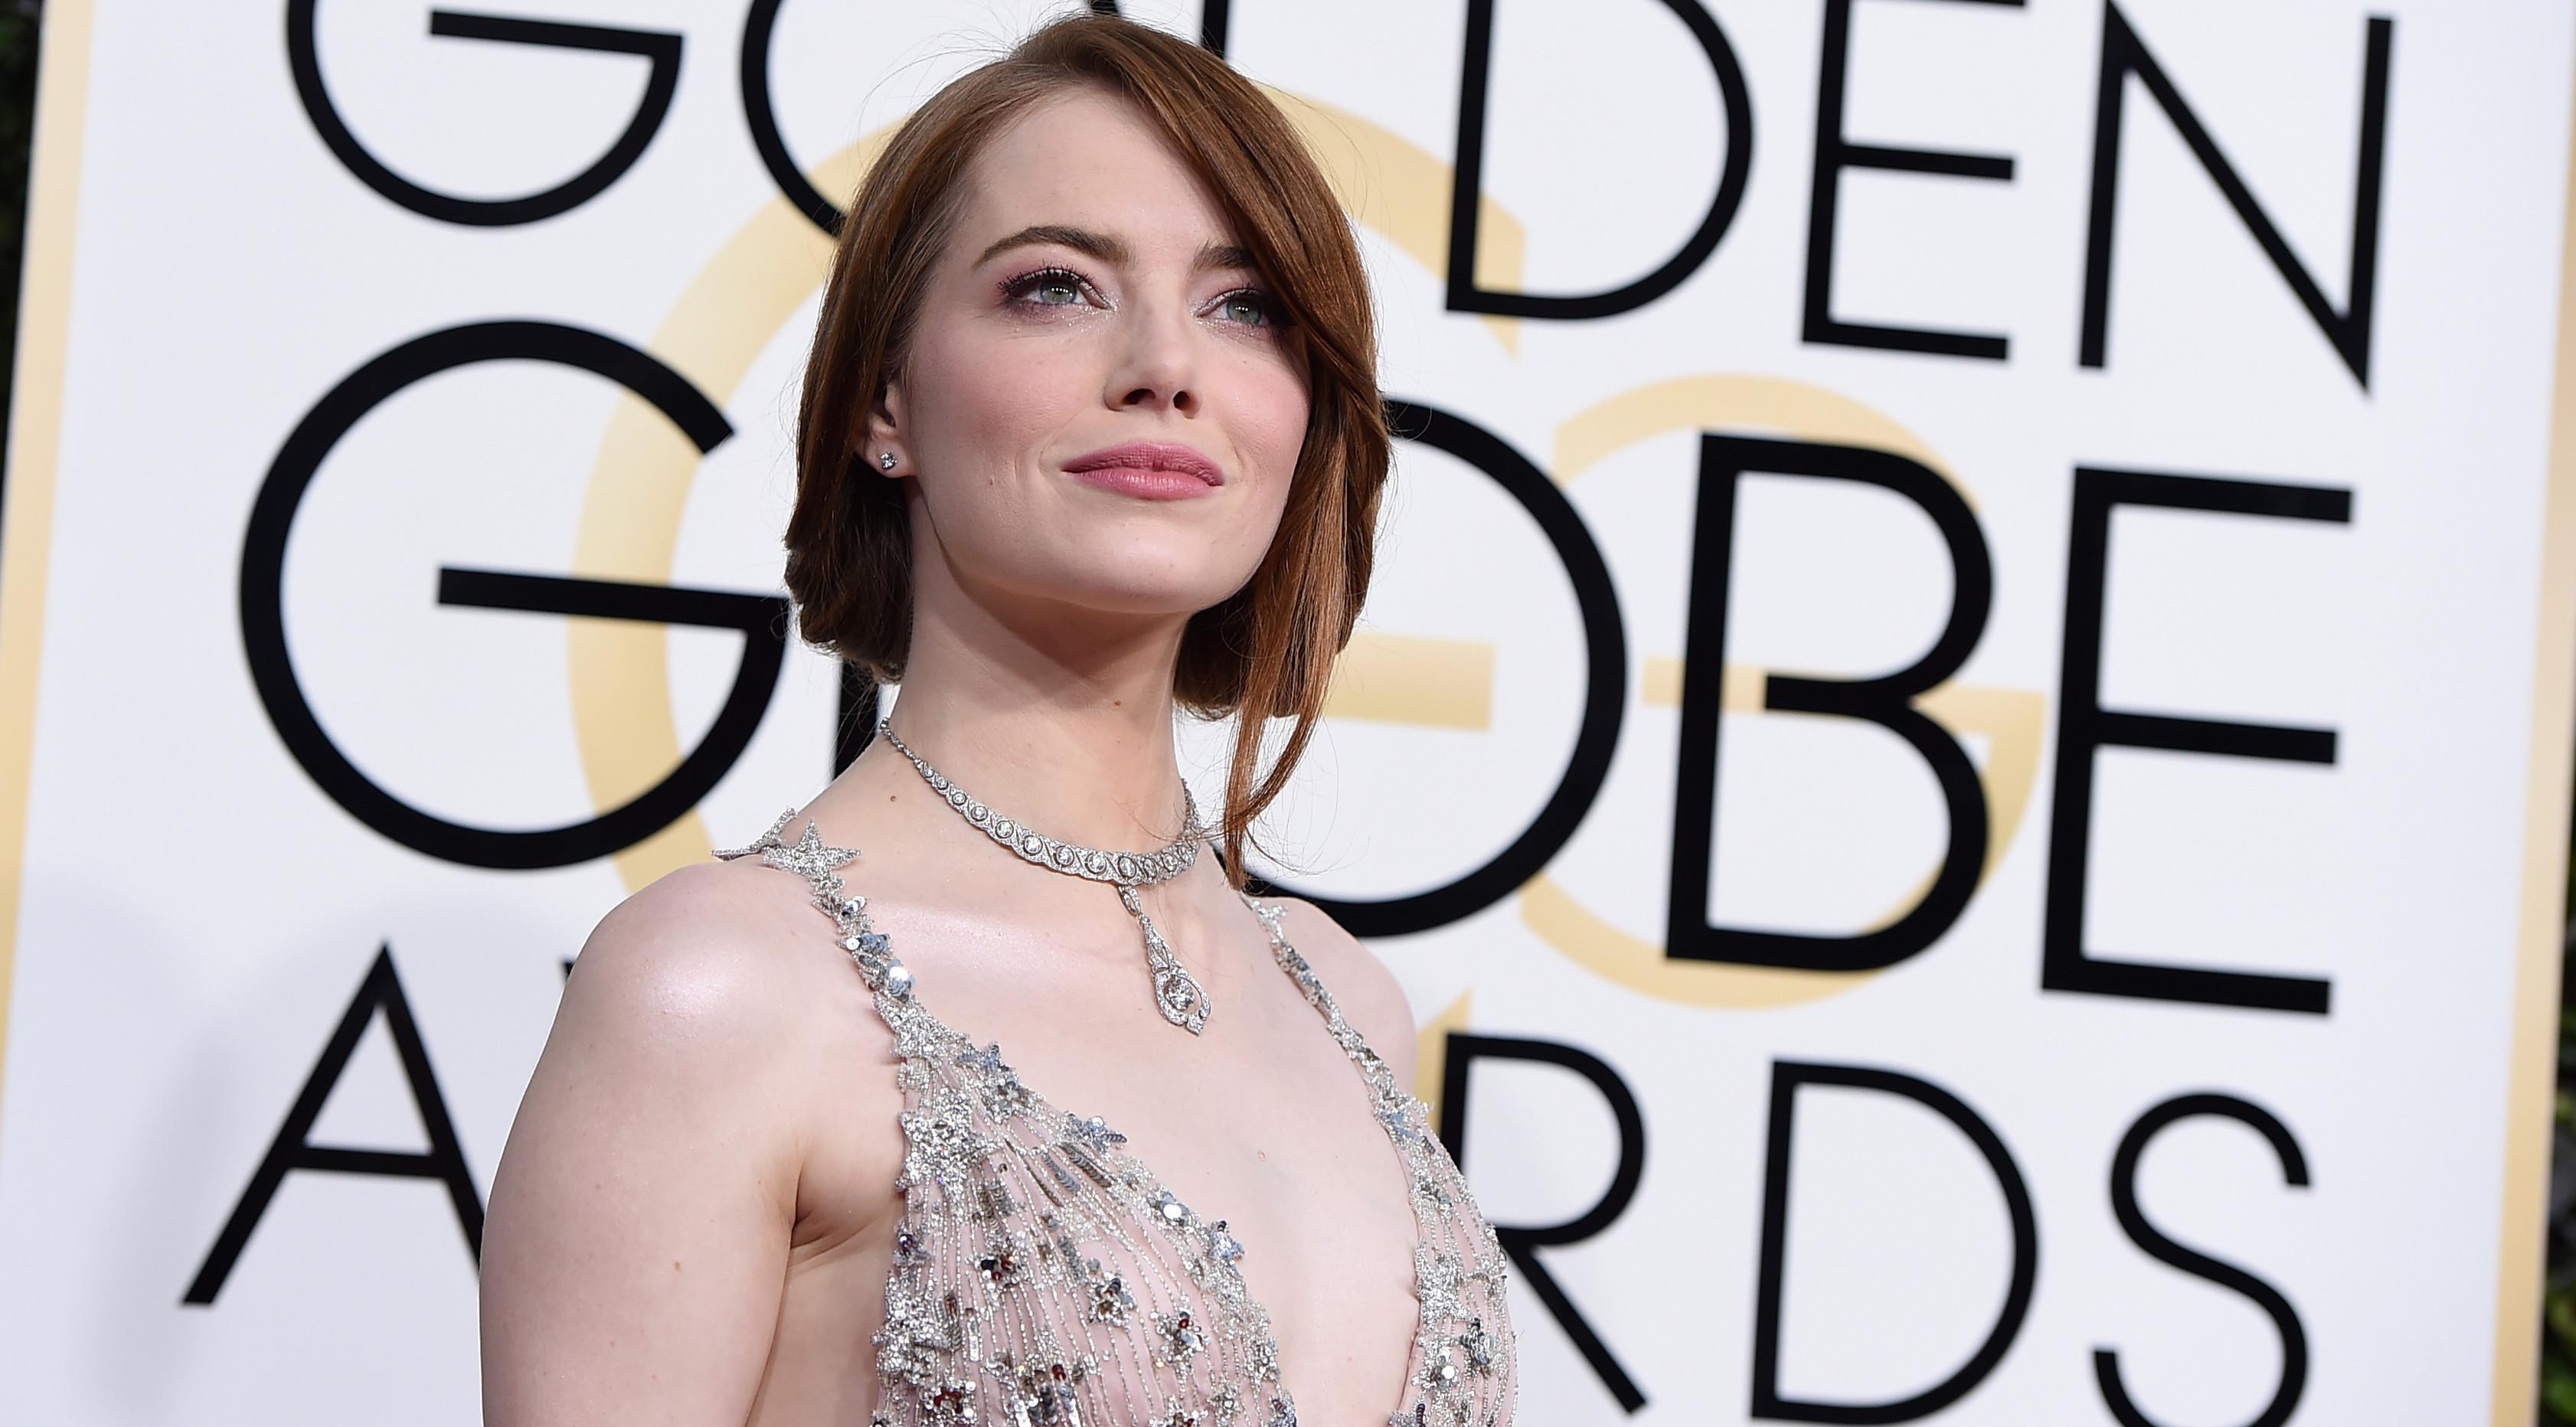 Aktris Emma Stone memilih gaun bergaris leher rendah saat menghadiri Golden Globe Awards 2017 di California, Minggu (8/1).Gaun tanpa lengan bernuansa merah muda itu bertabur pernak-pernik bintang yang mengilap.  (Photo by Jordan Strauss/Invision/AP)